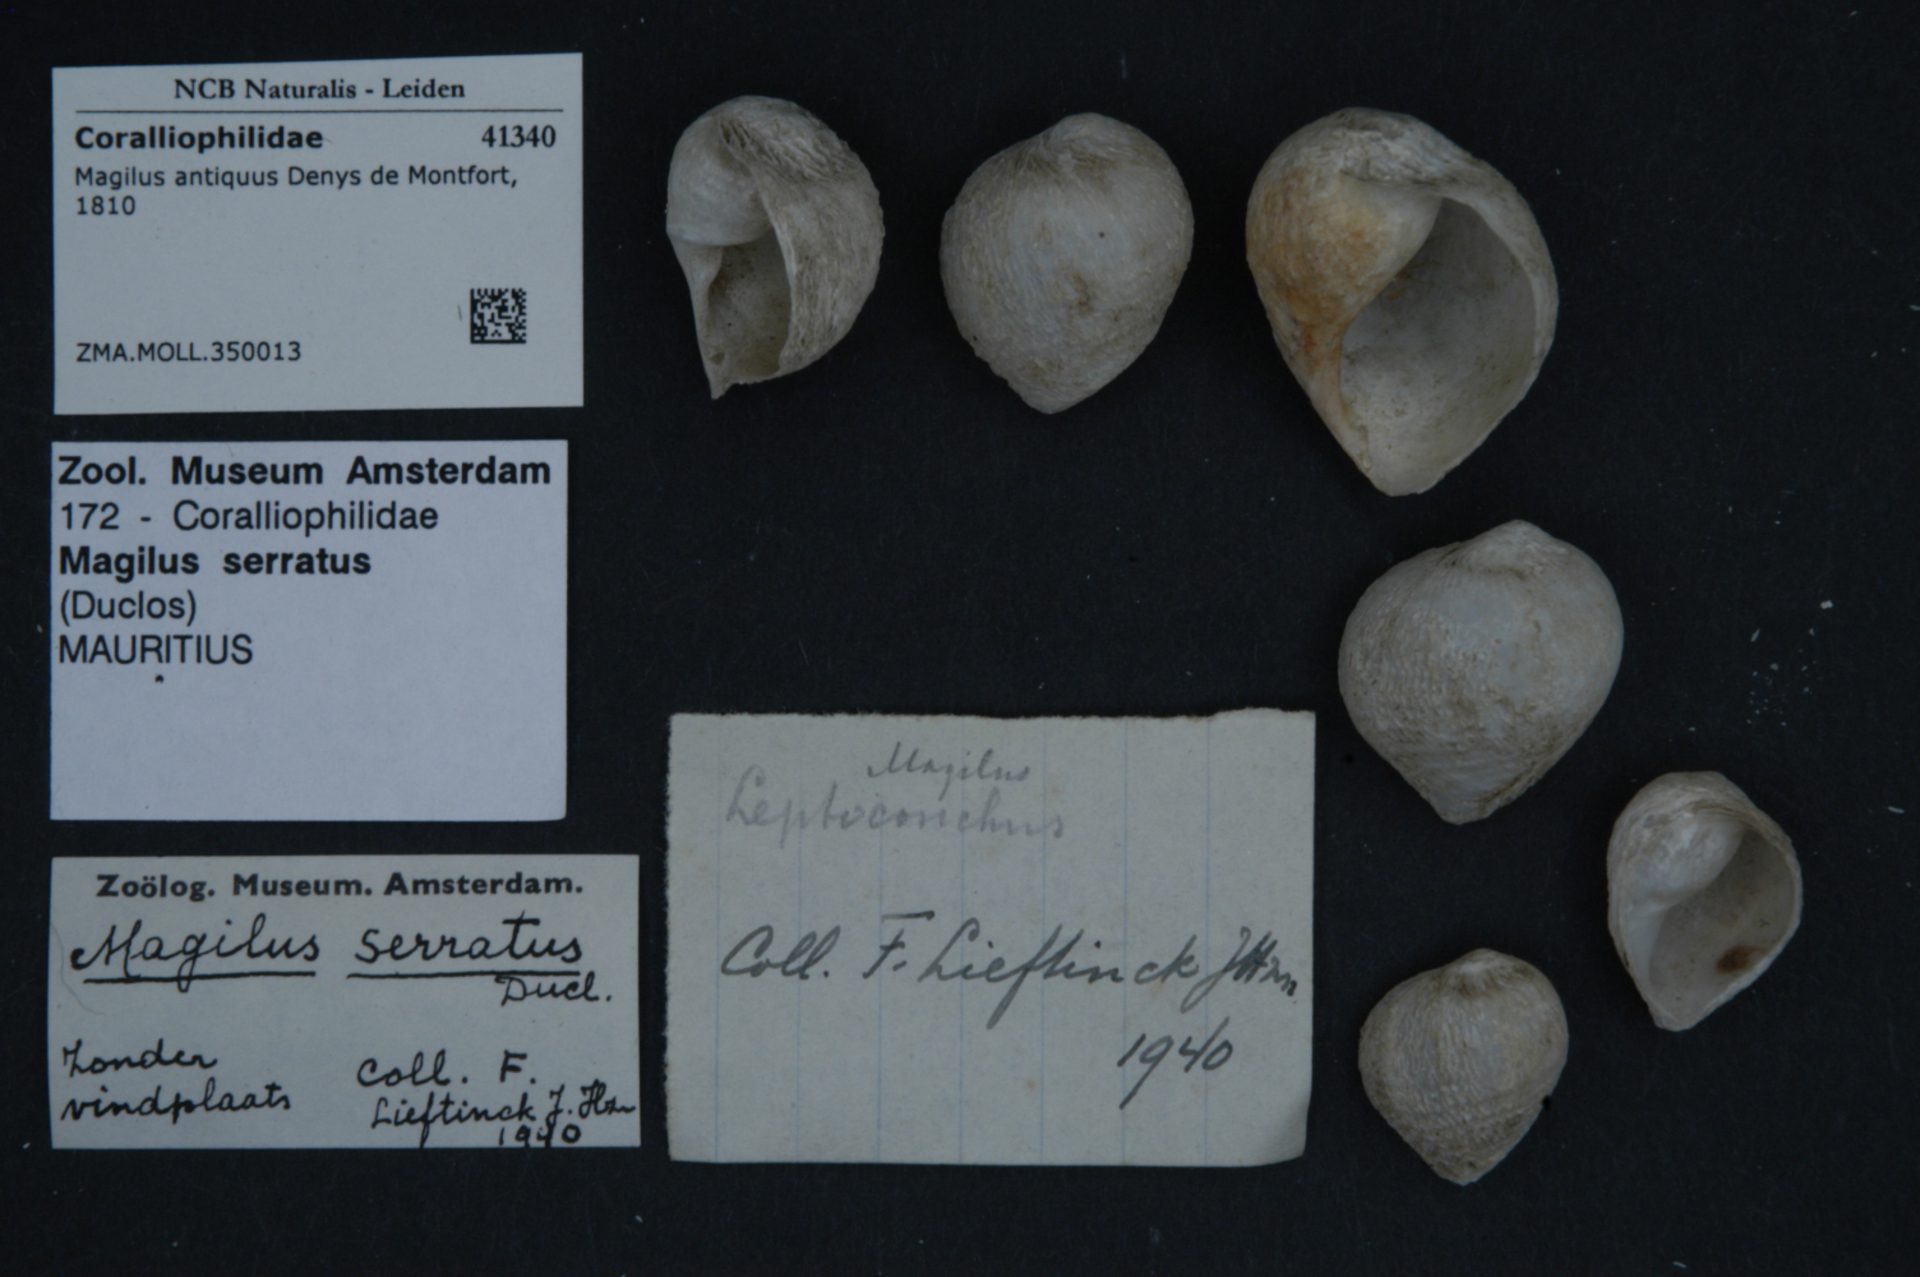 ZMA.MOLL.350013   Magilus antiquus Denys de Montfort, 1810